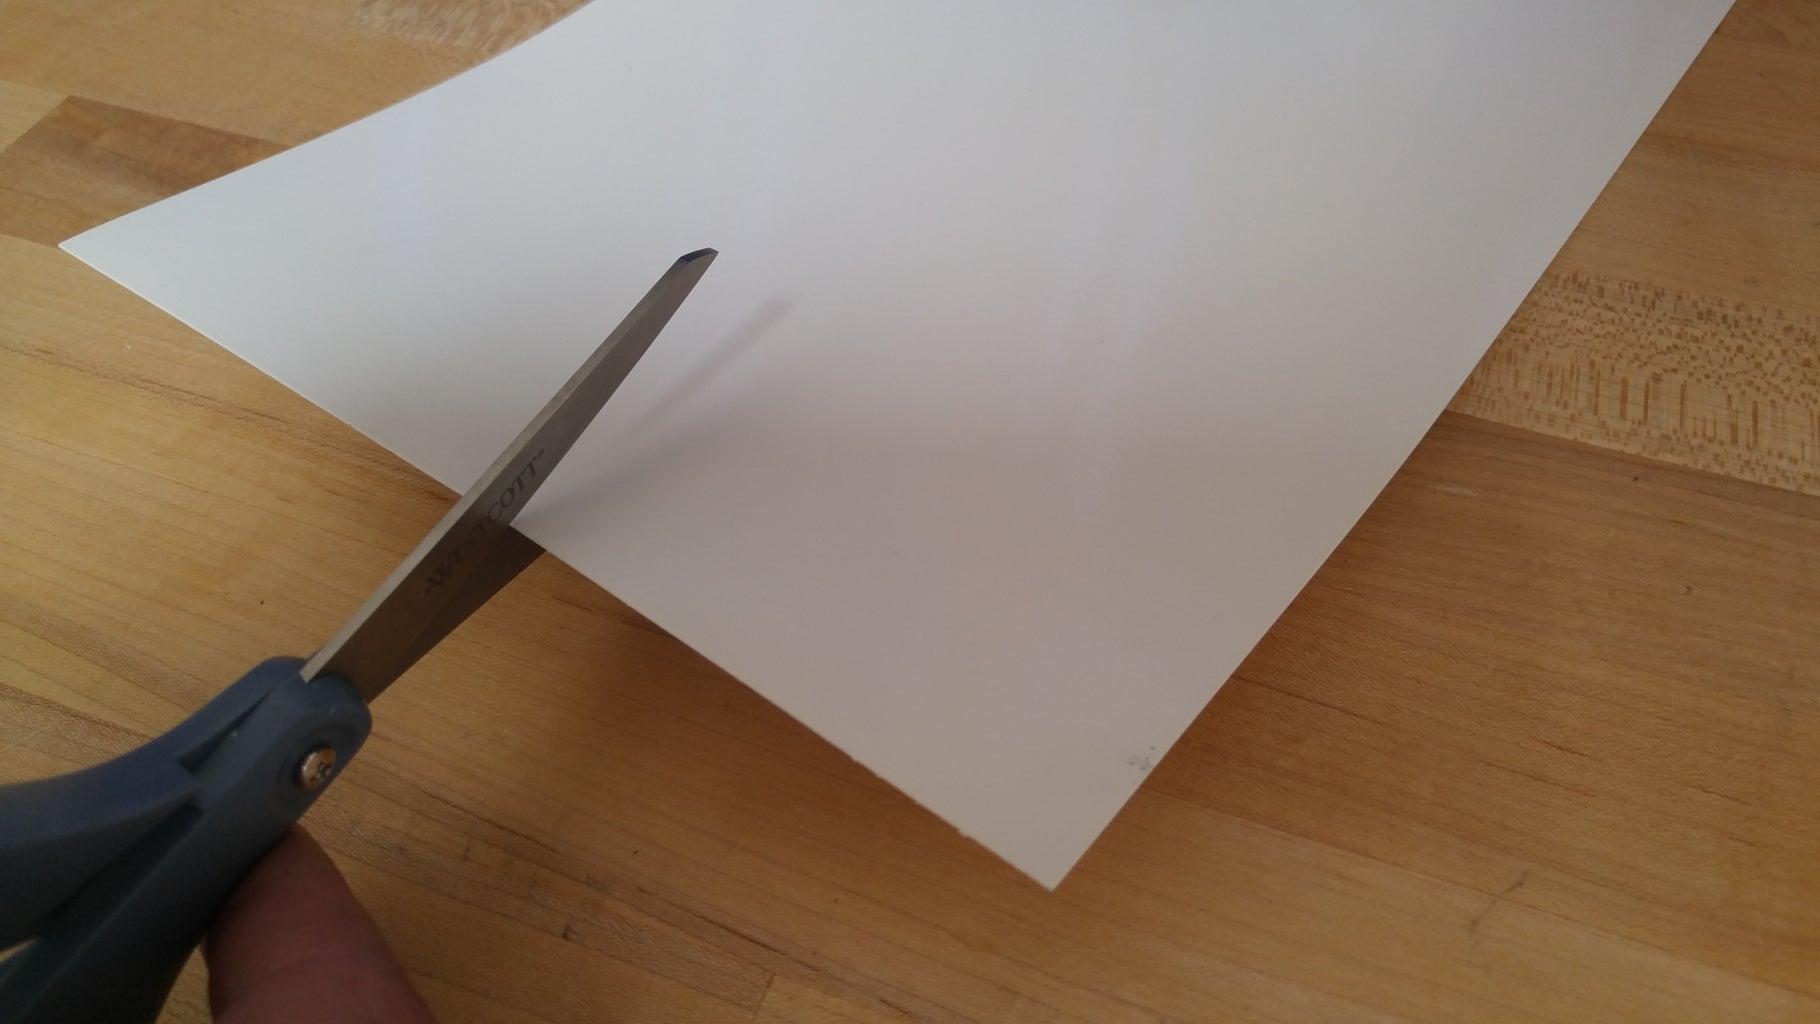 Adhere Dry Erase Materials